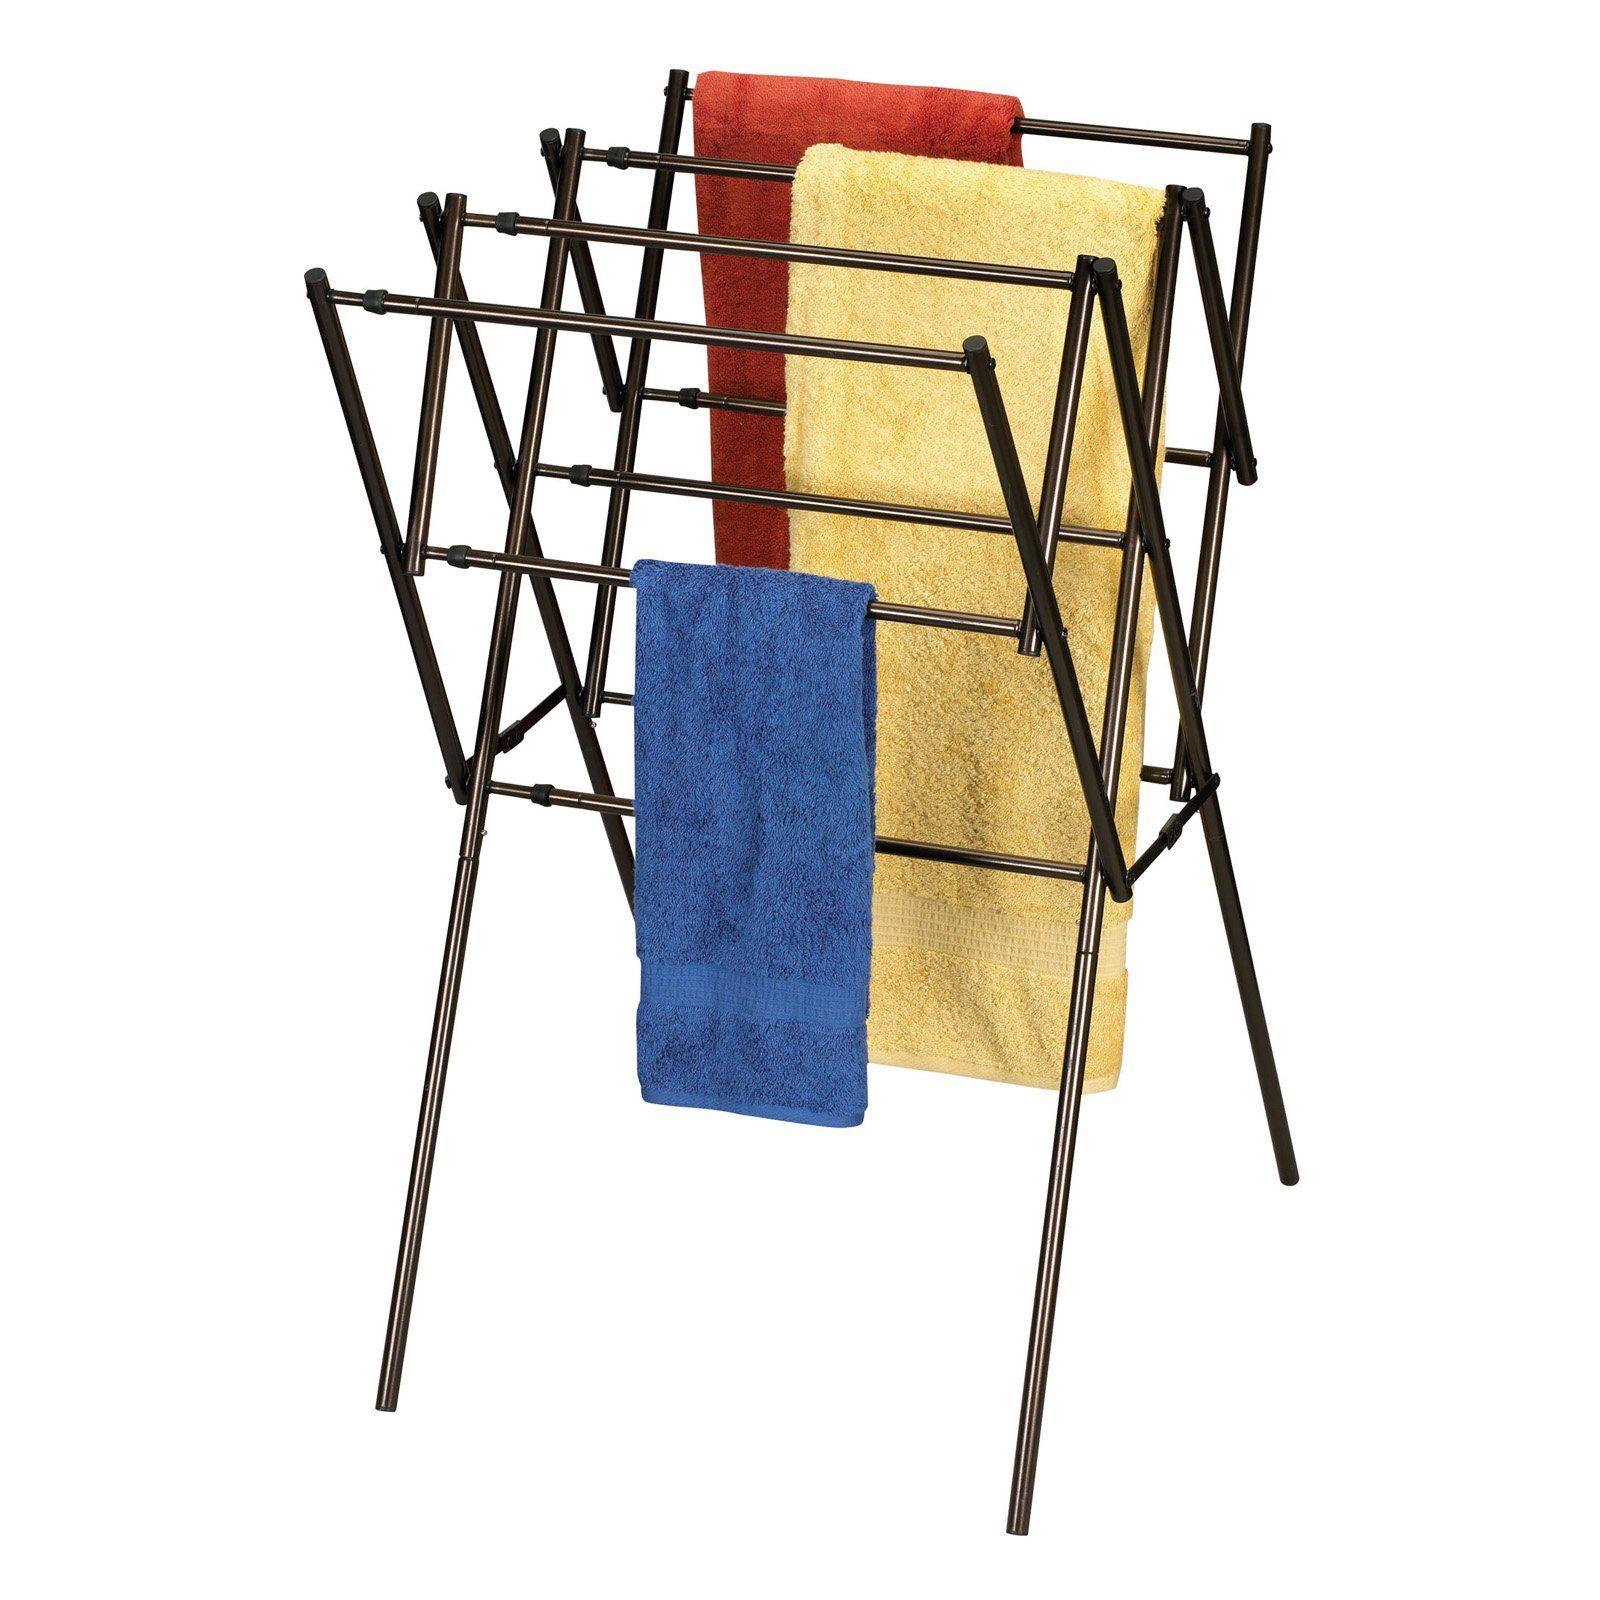 Household Essentials Expandable Clothes Dryer - Antique Bronze Frame - 5175